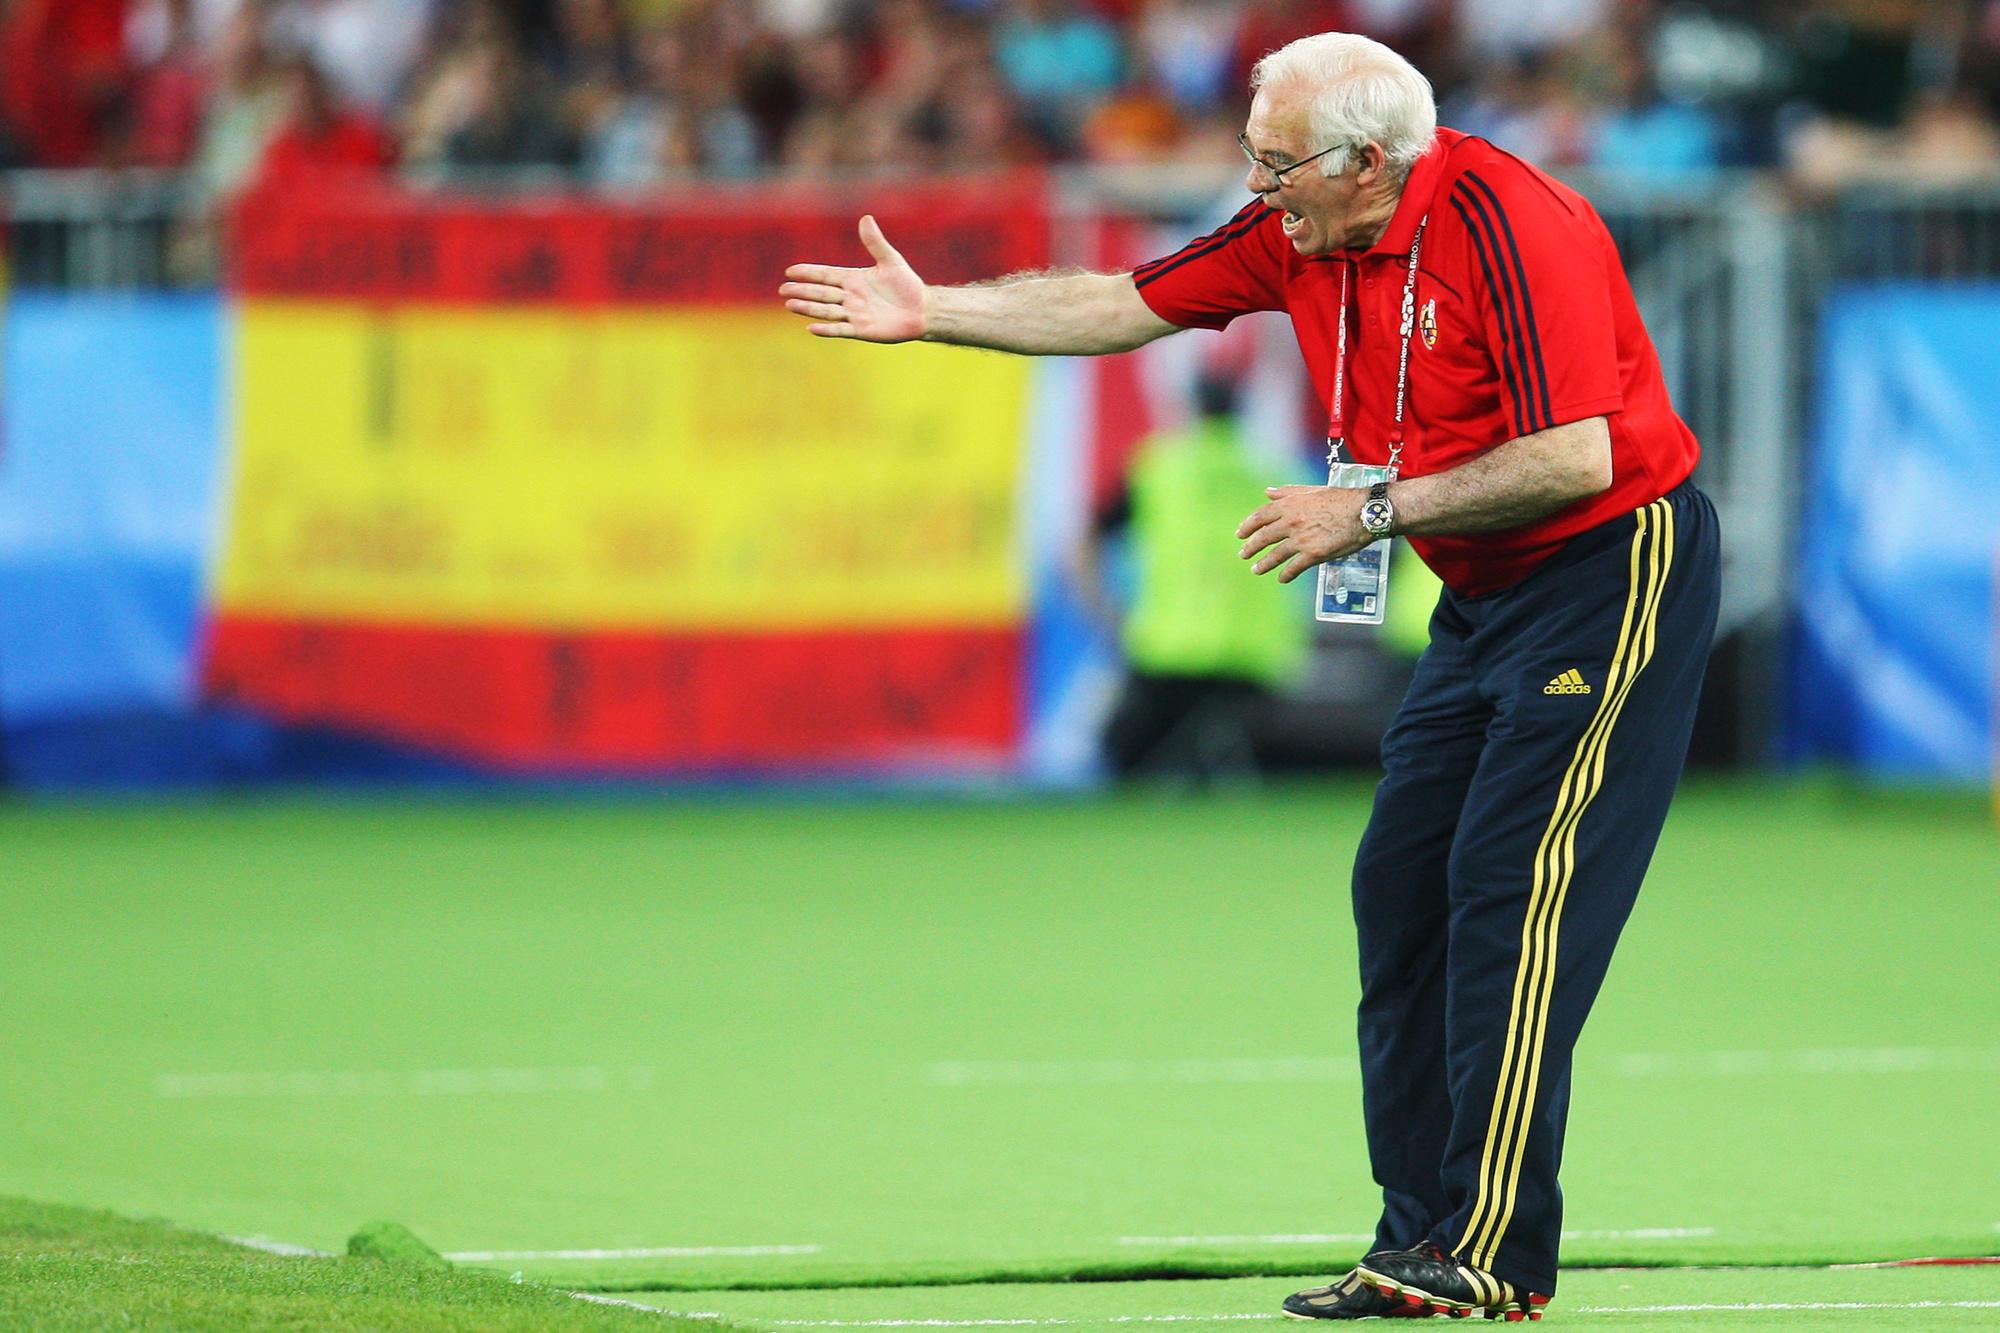 Luis Aragonés, de bondscoach die Spanje naar Europees goud leidde, GETTY